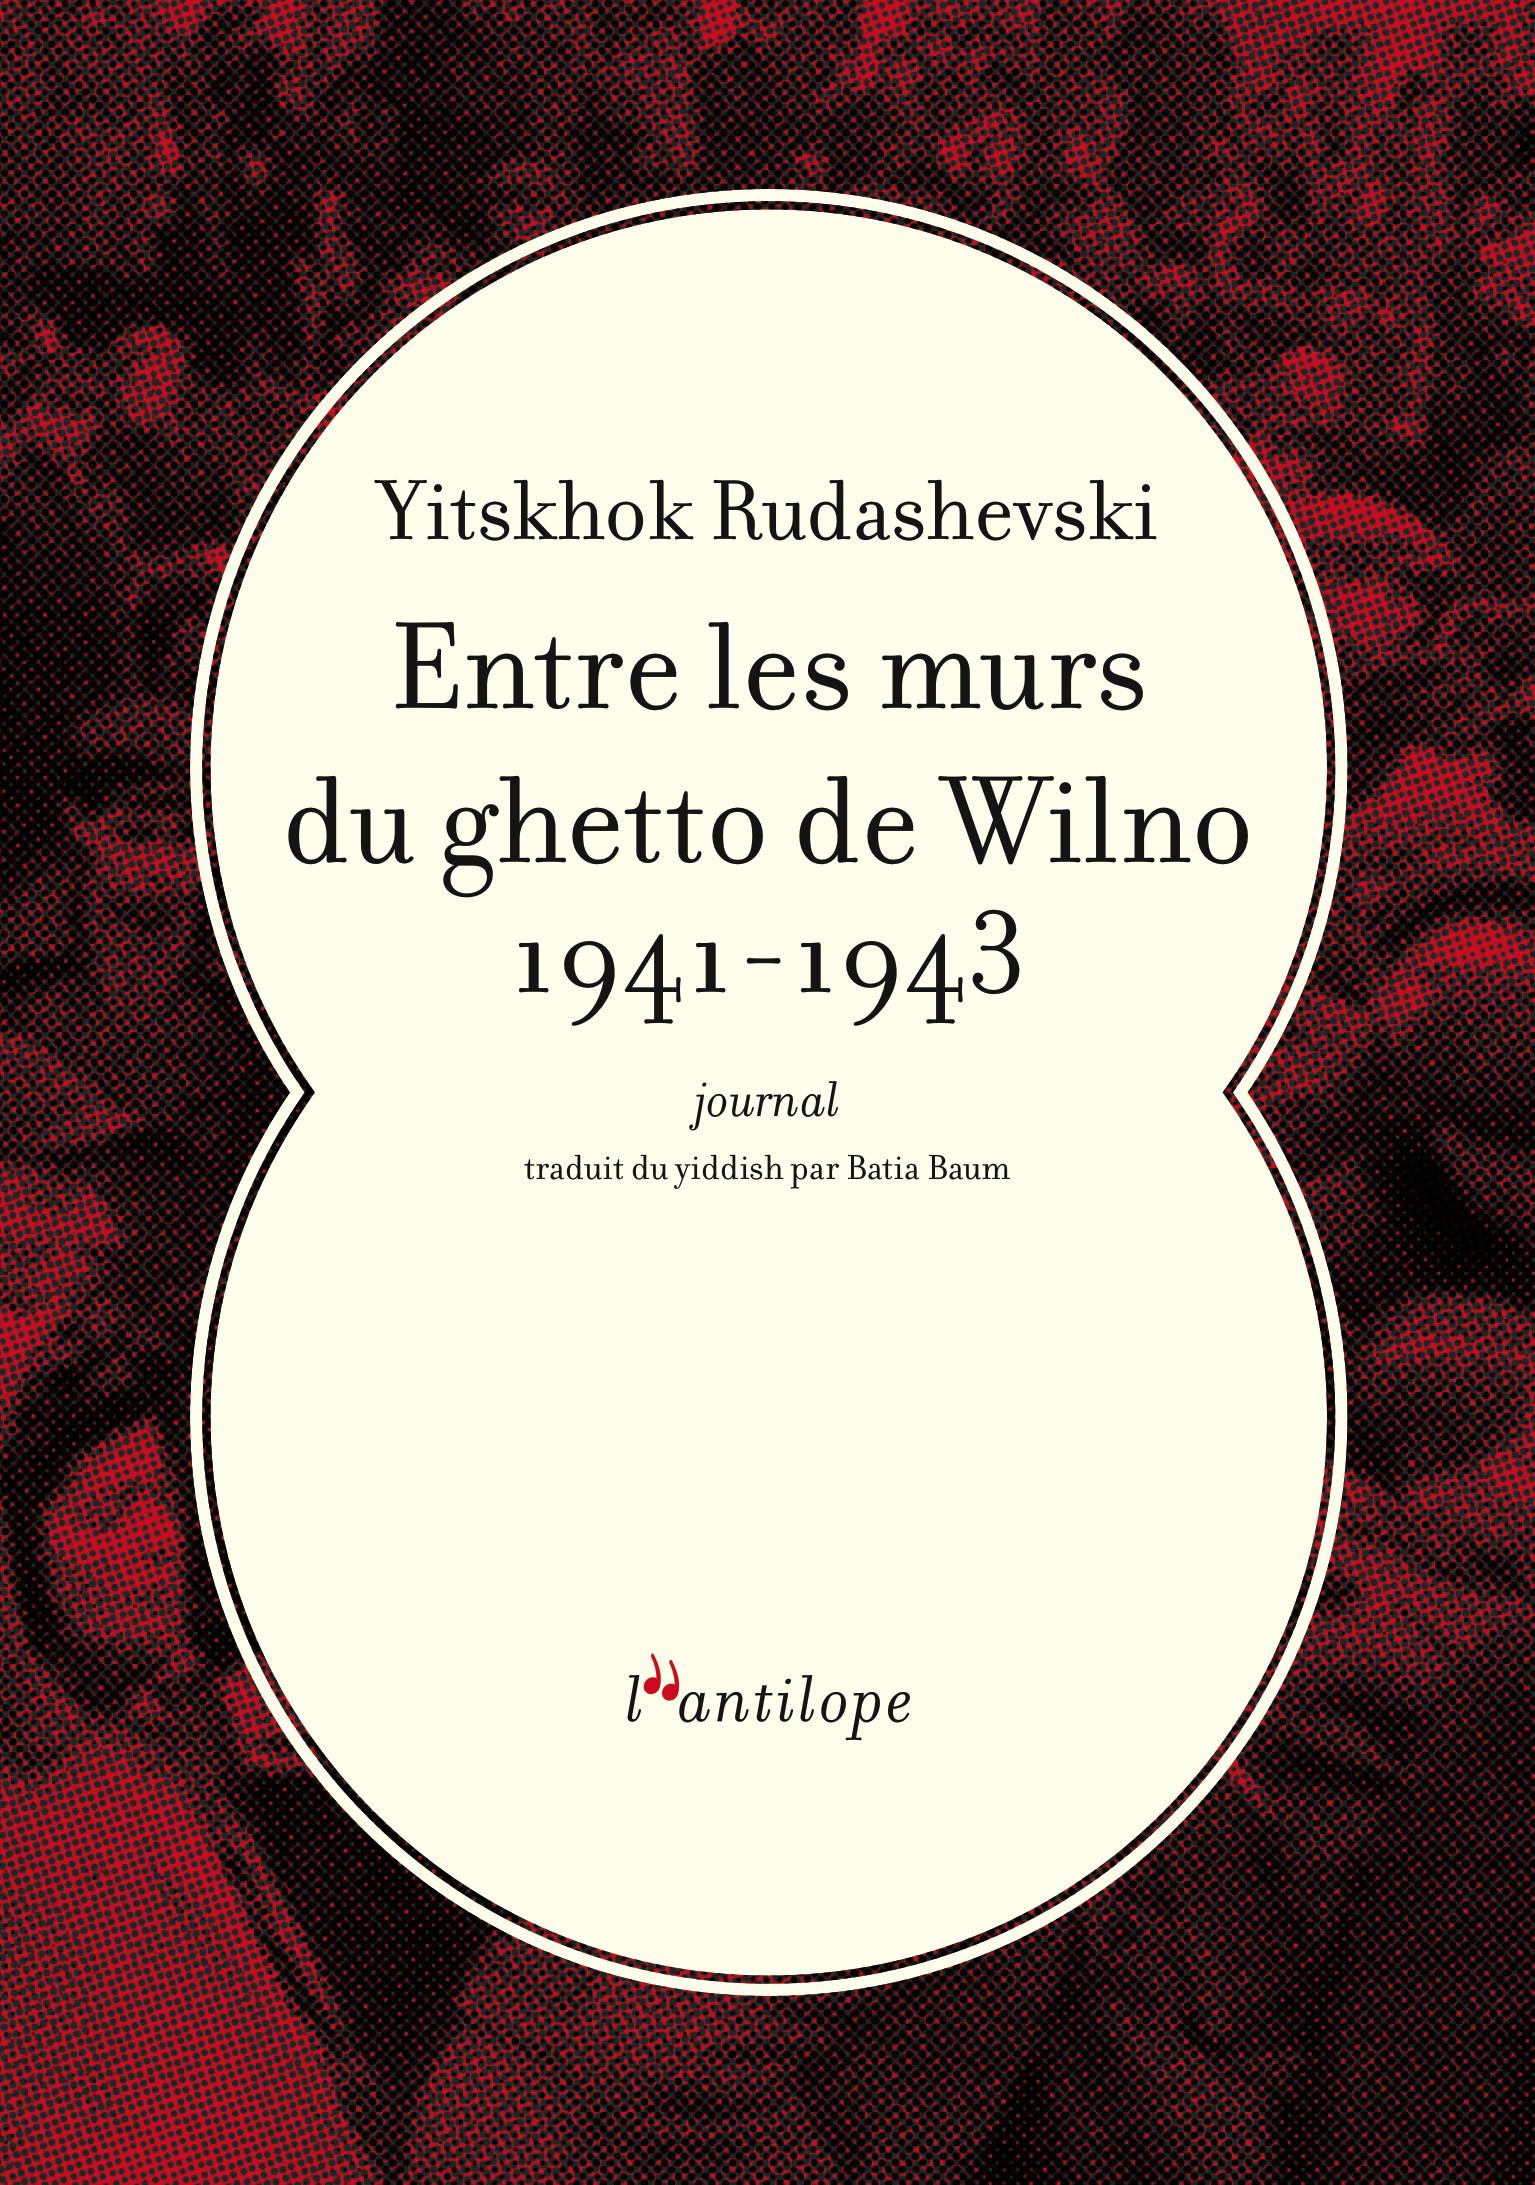 Entre les murs du ghetto de Wilno 1941-1943